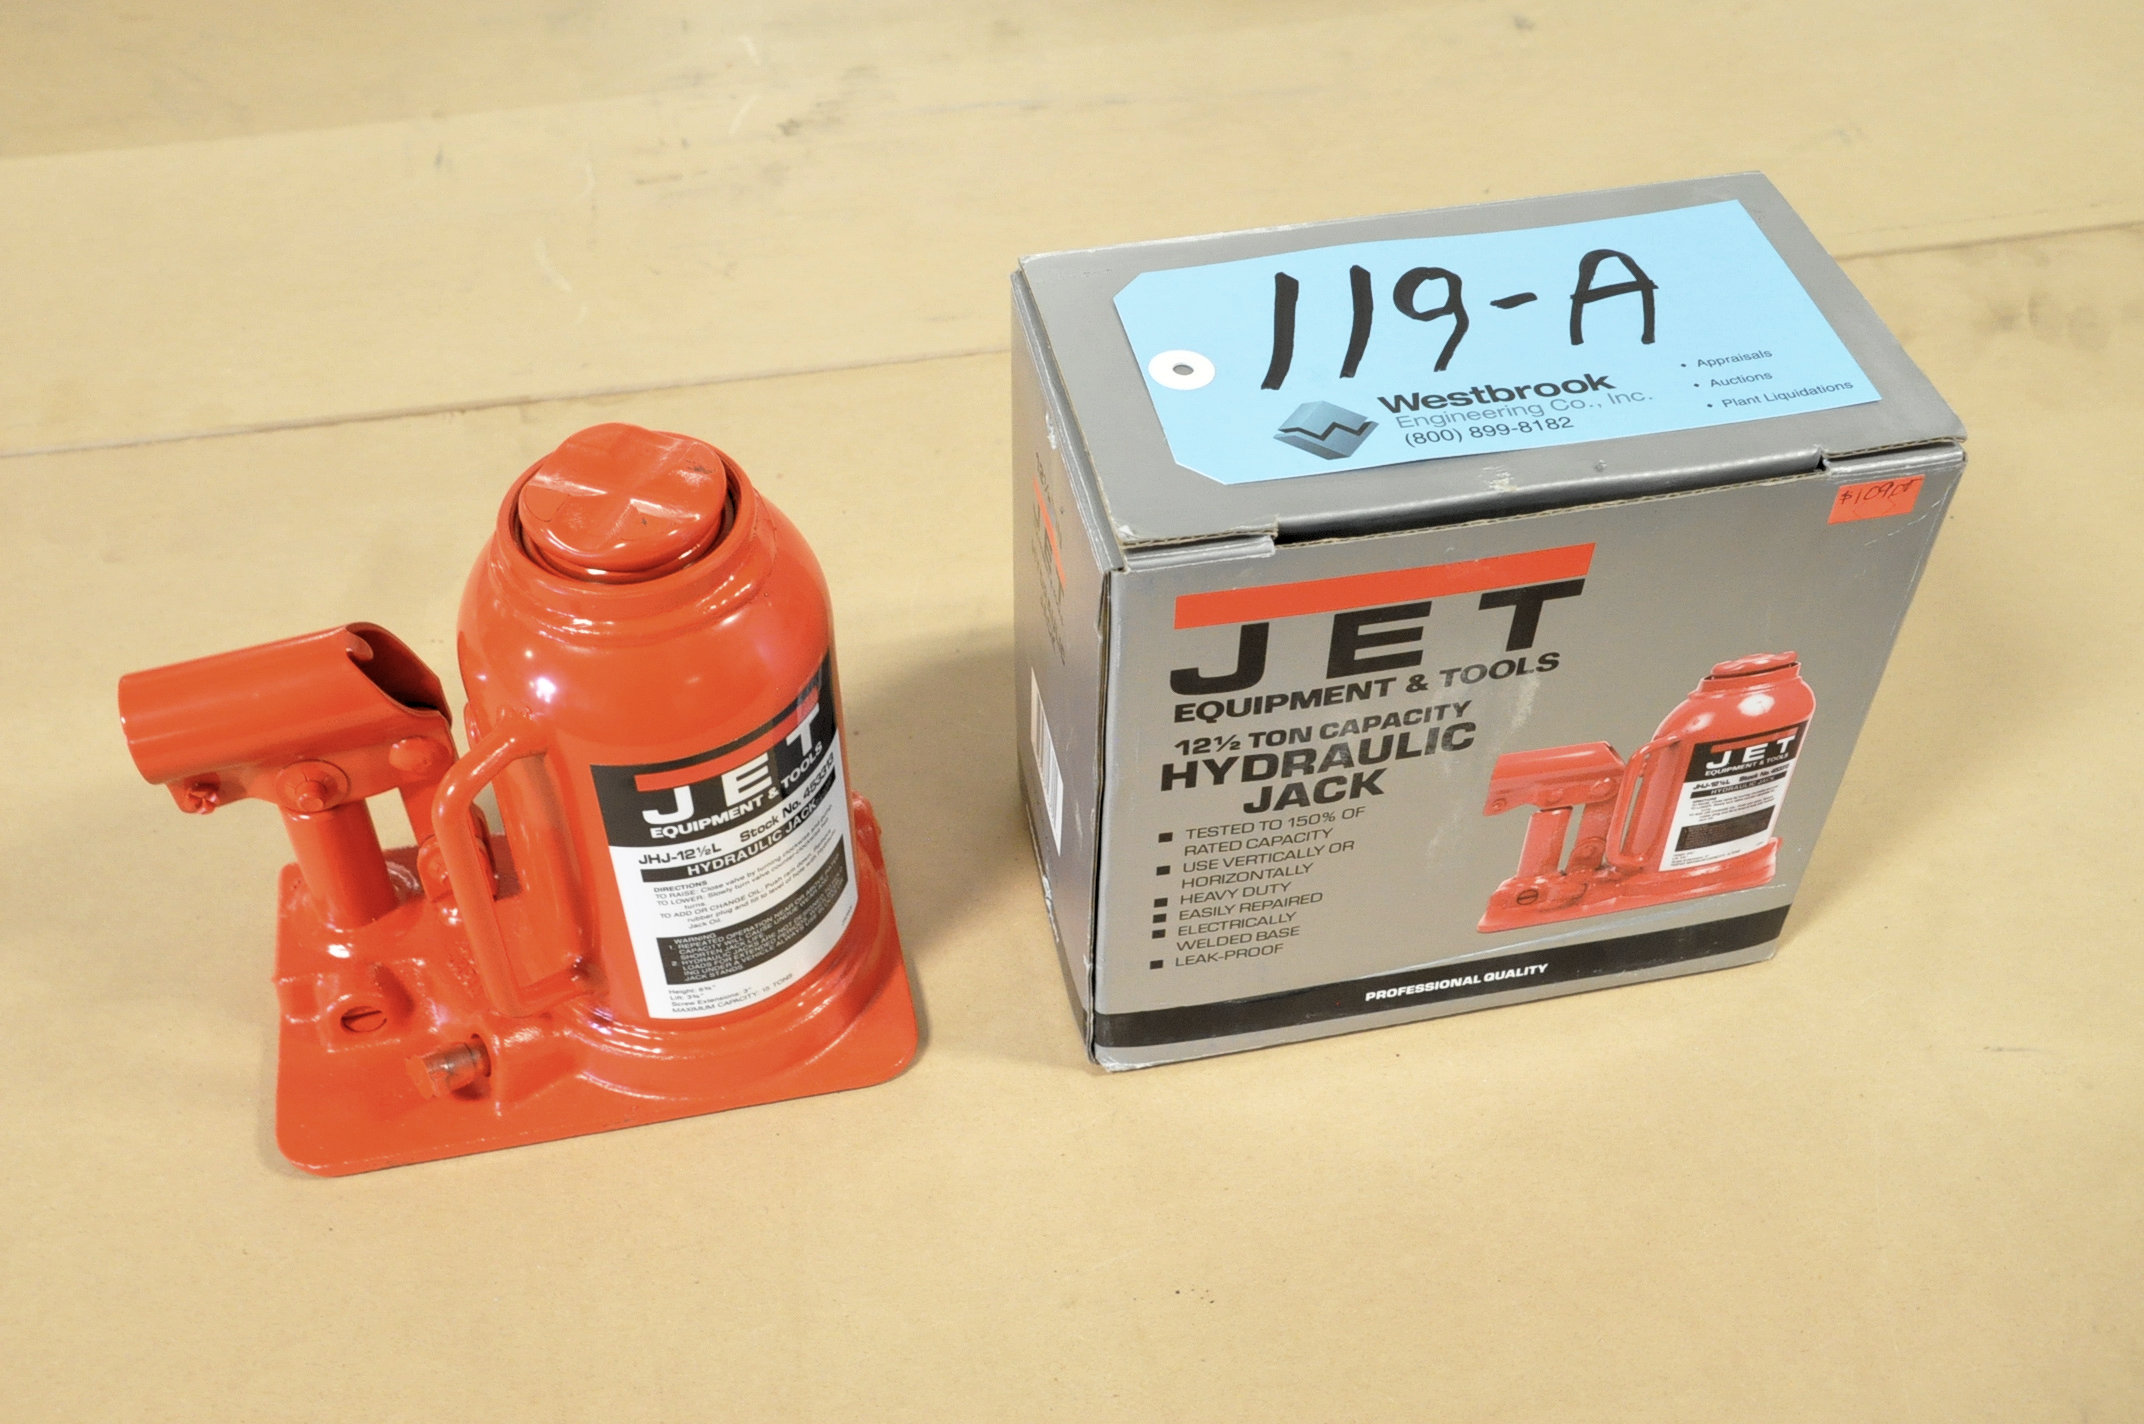 Jet Stock No. 453313, 12 1/2-Ton Capacity Hydraulic Bottle Jack, (Packaged)